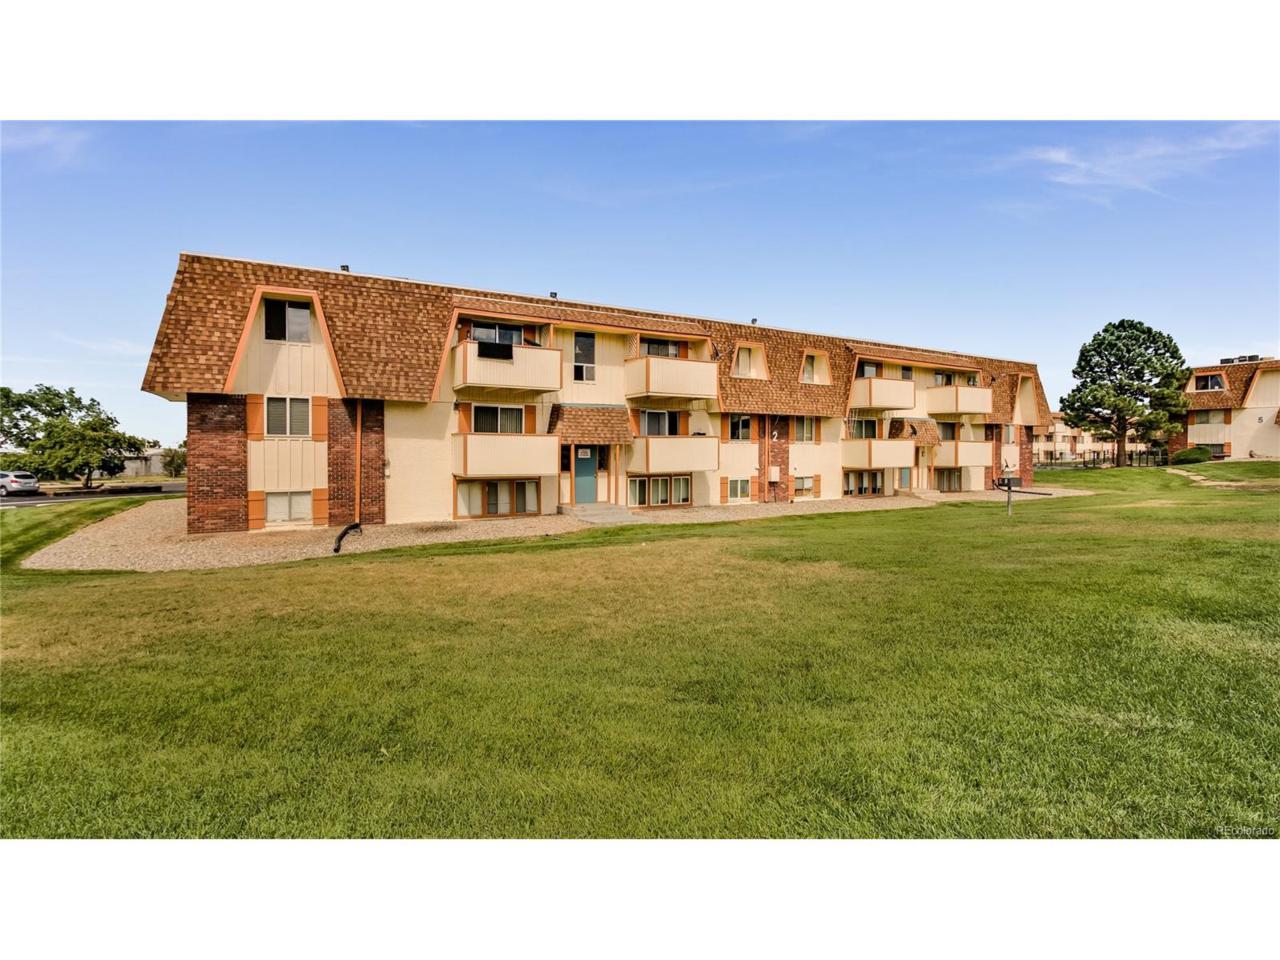 10211 Ura Lane 2-307, Thornton, CO 80260 (MLS #2392748) :: 8z Real Estate